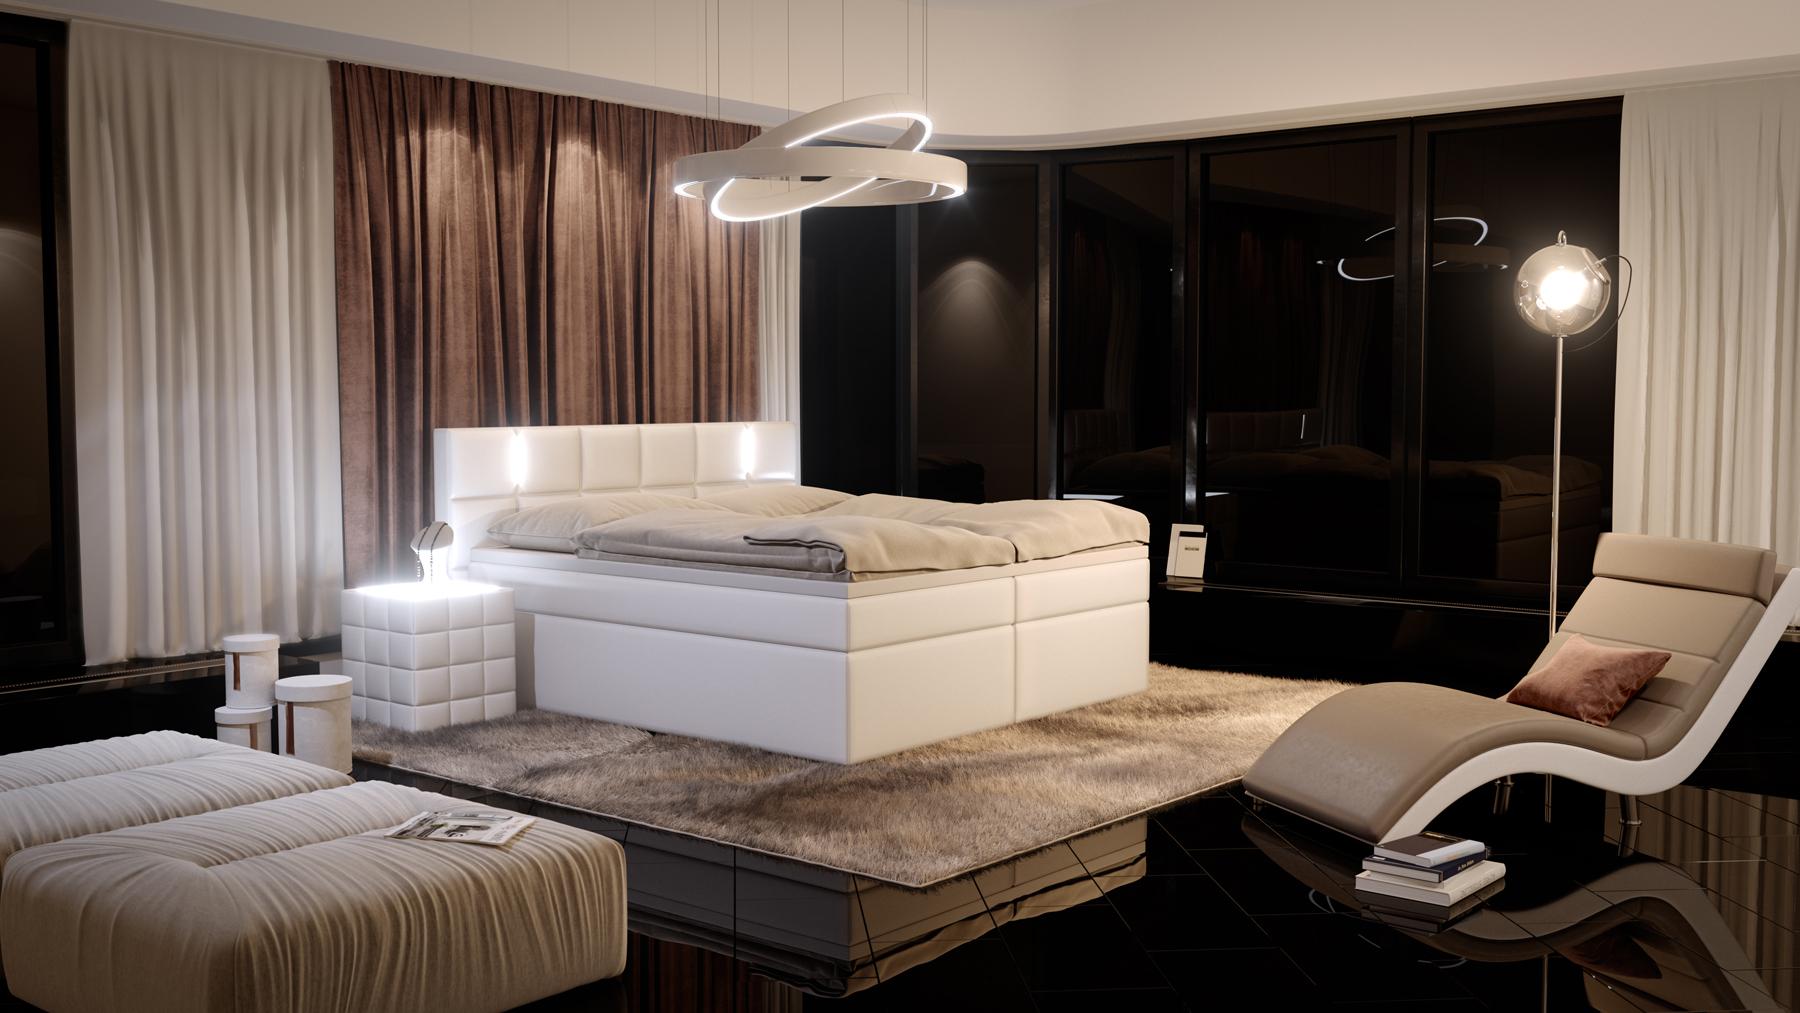 Boxspringbett design  SAM® Boxspringbett mit LED Hotelbett 200 x 200 cm weiß Salerno ...